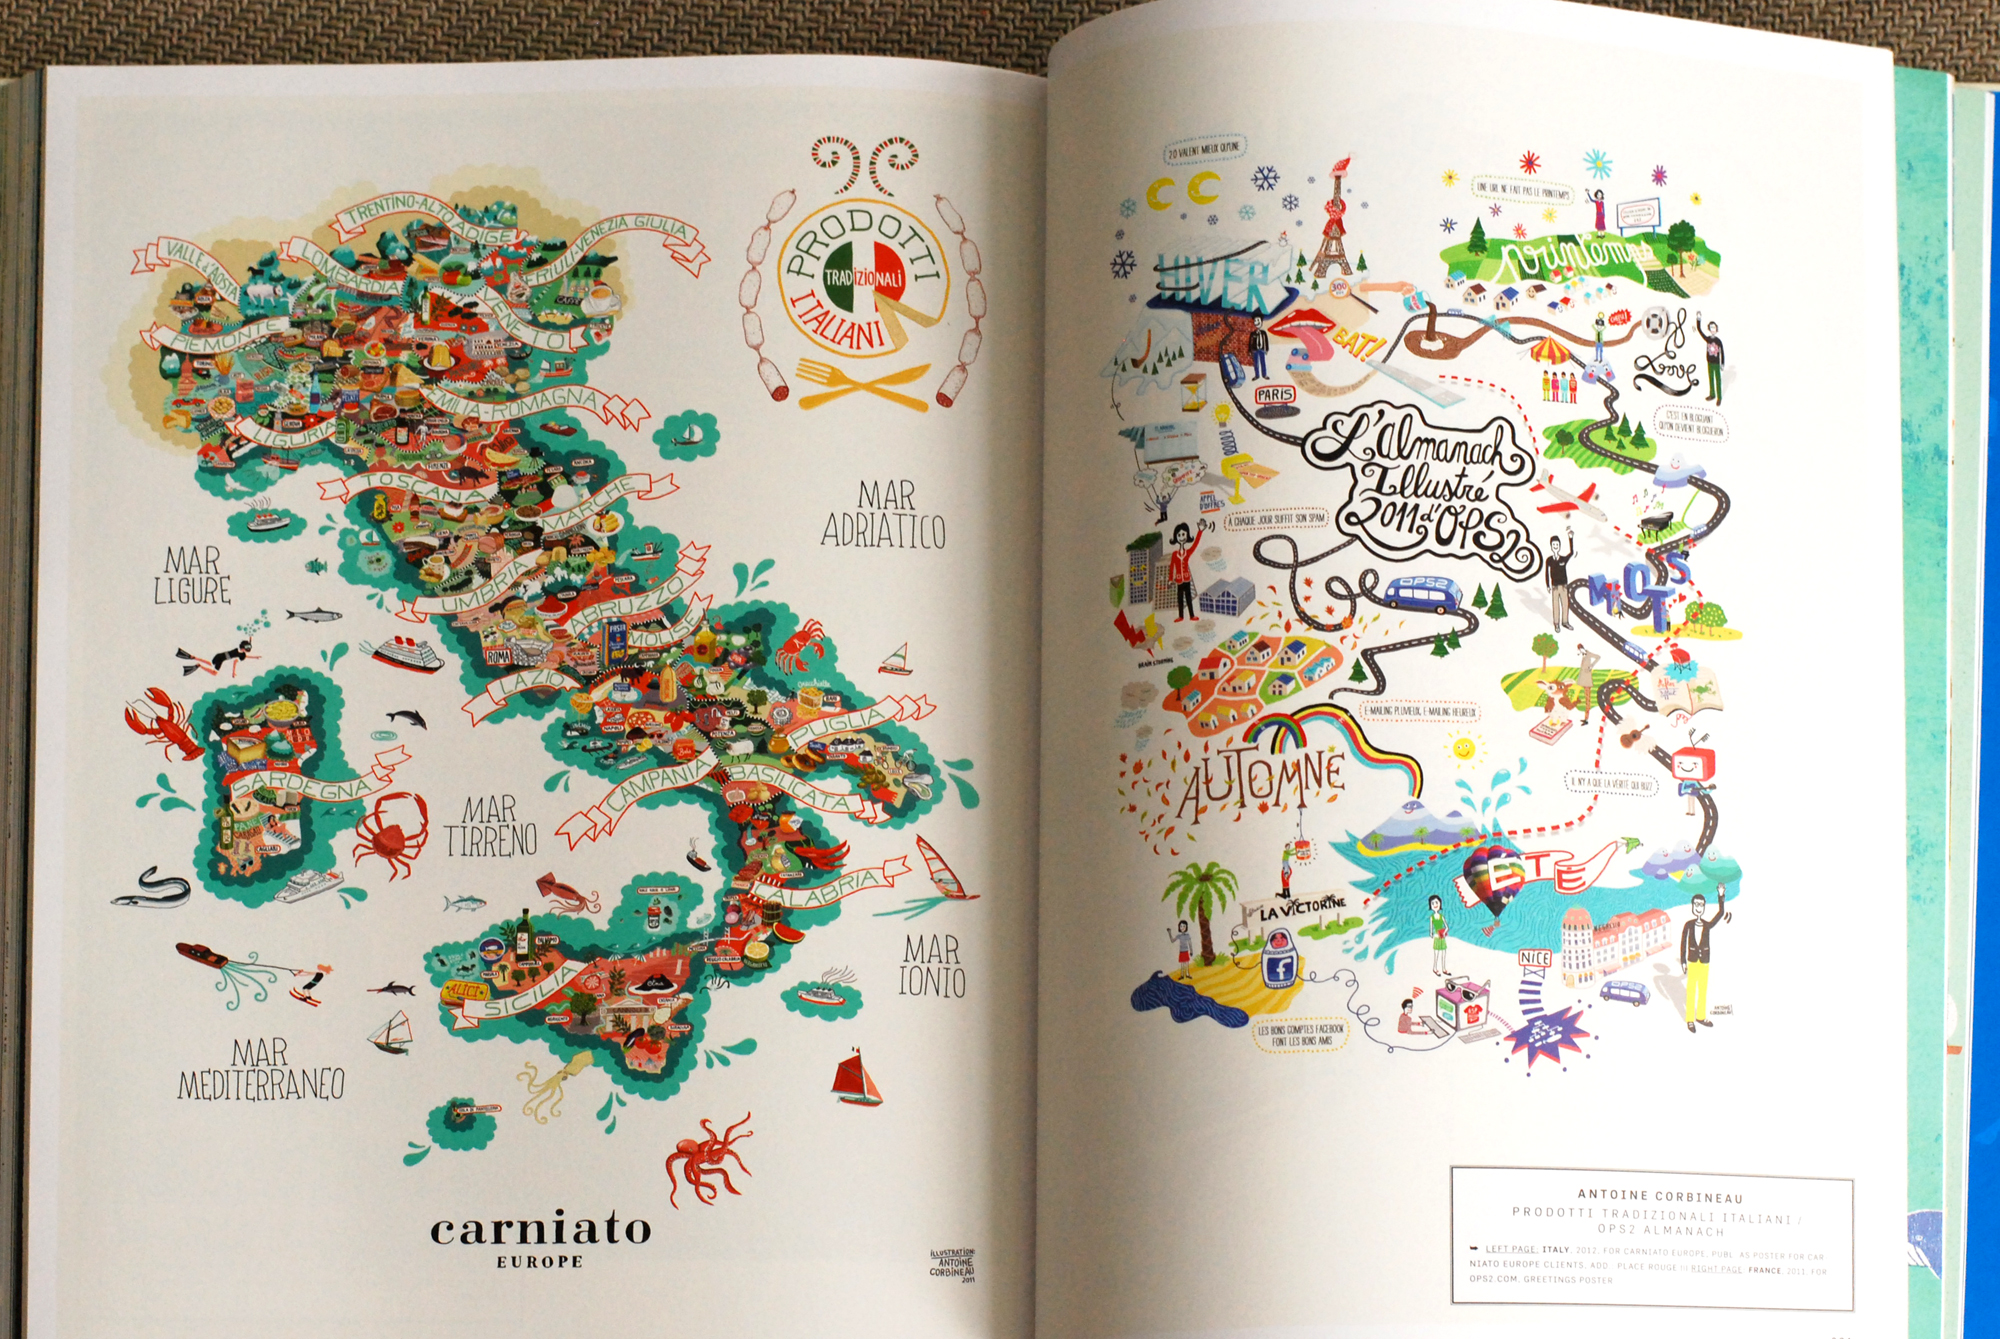 Antoine Corbineau @ A Map of the World